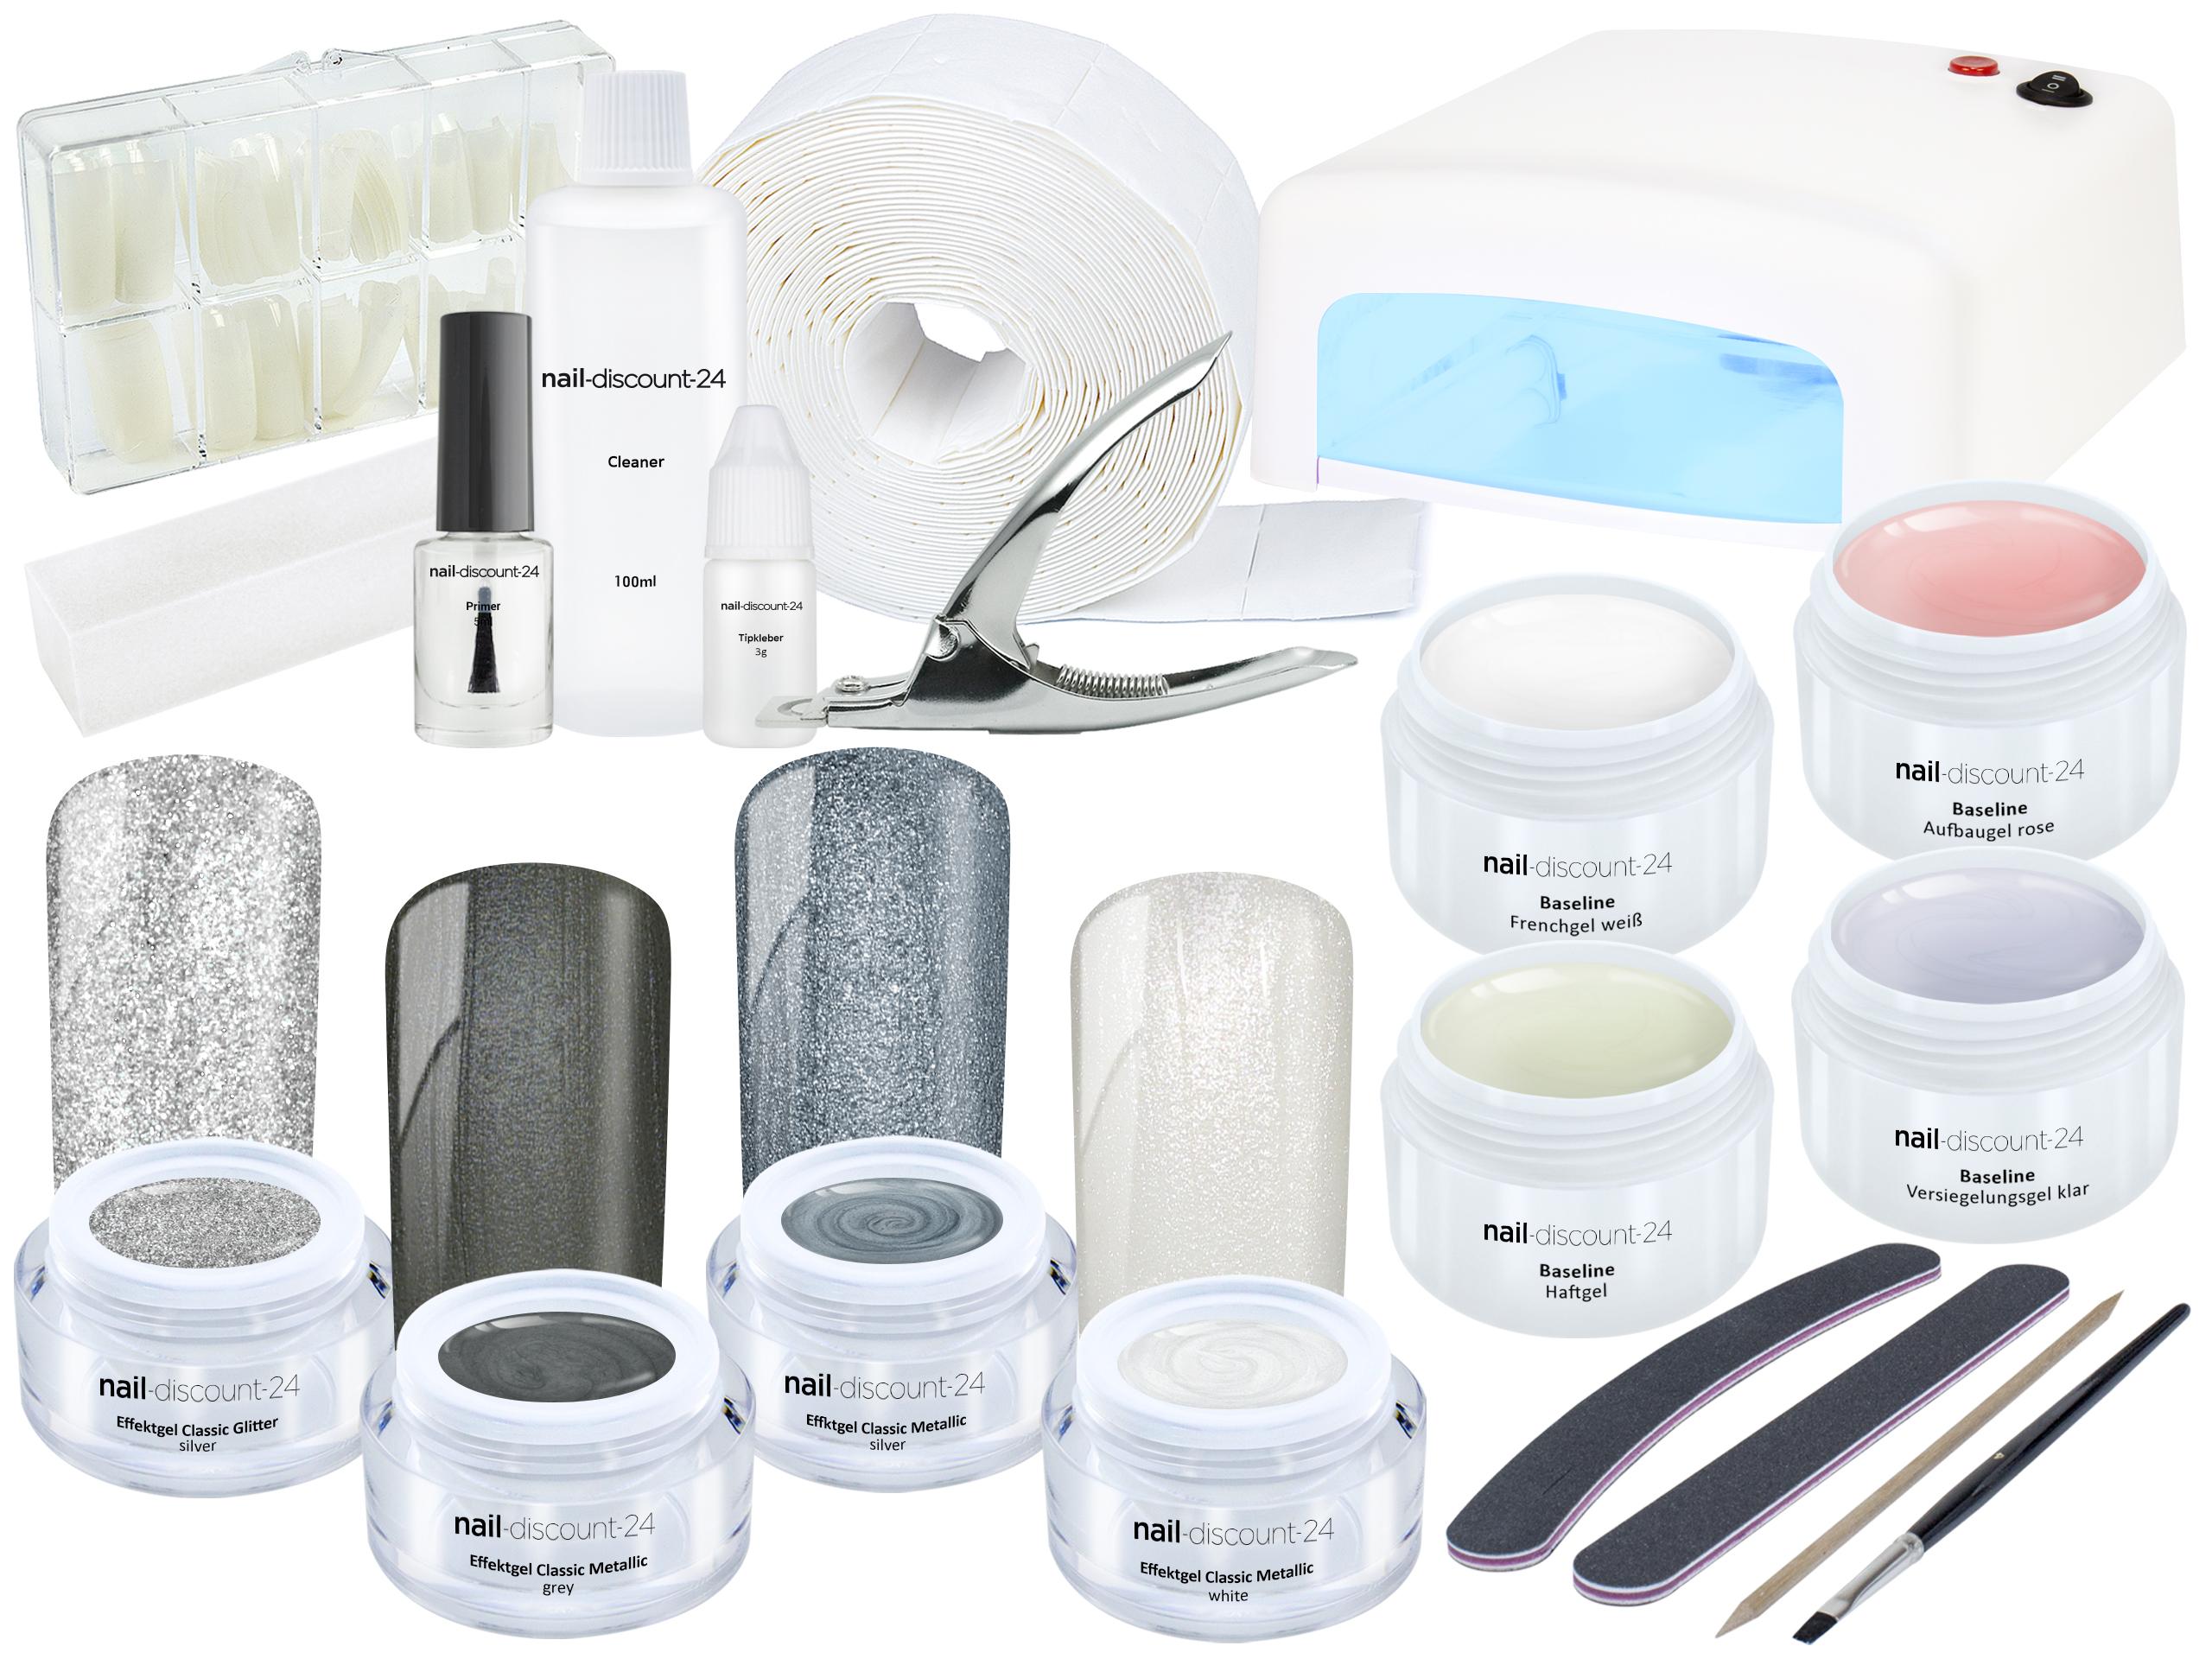 xxl nagelstudio farb uv gel starter set pearl shine nail. Black Bedroom Furniture Sets. Home Design Ideas